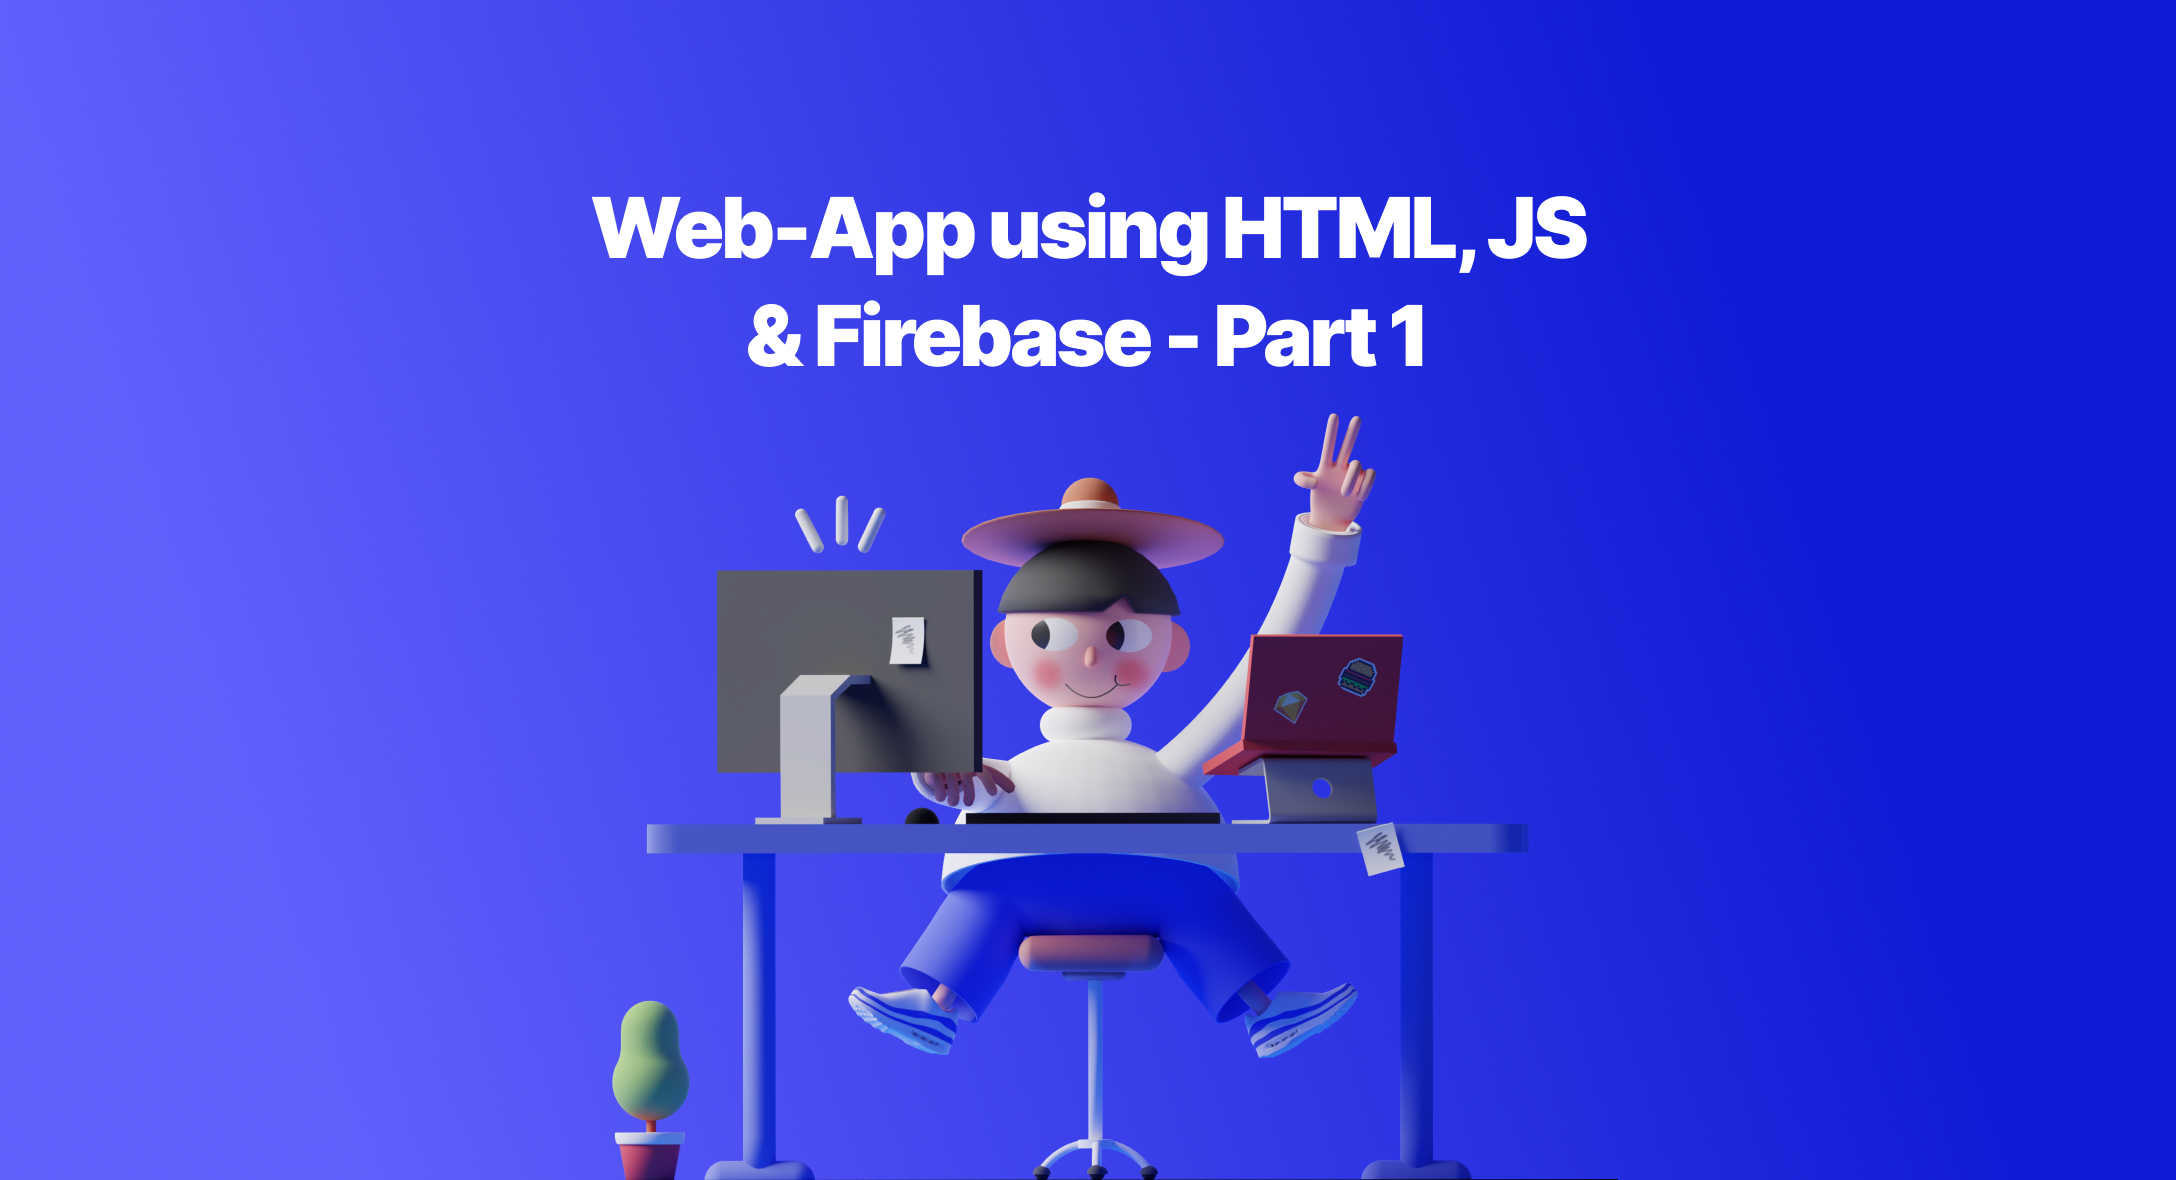 Web-App using HTML, JS & Firebase - Part 1